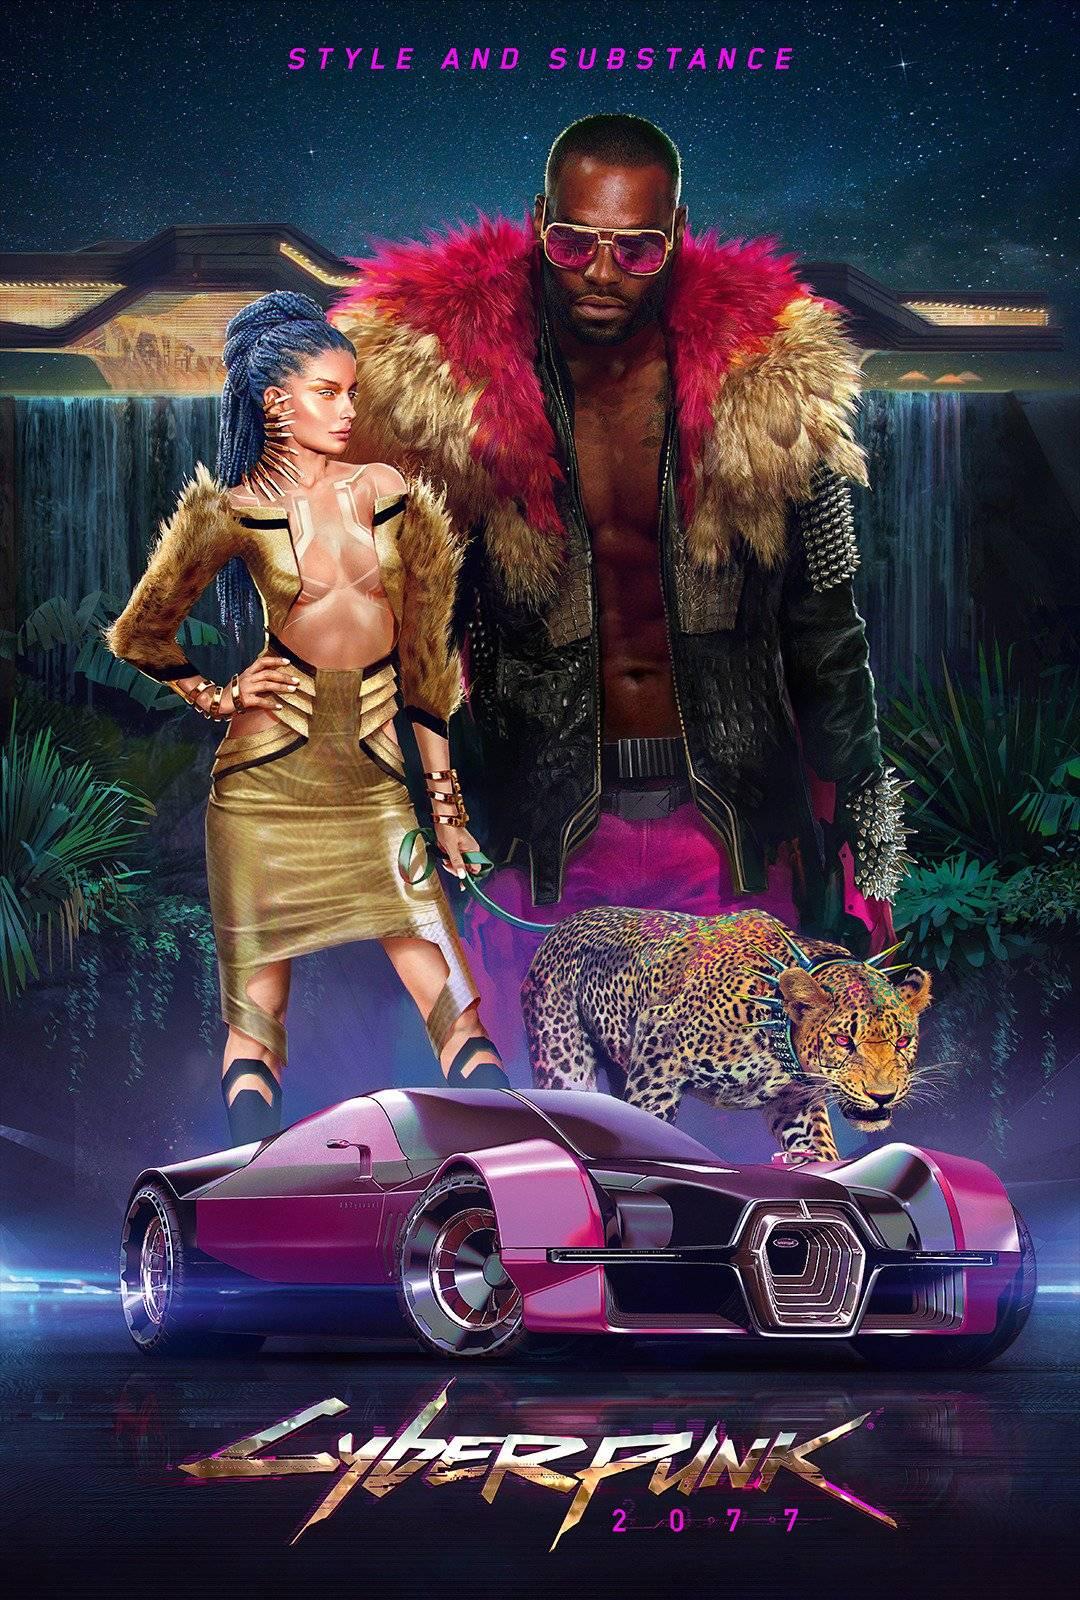 Стили Cyberpunk 2077 в одежде и архитектуре 4